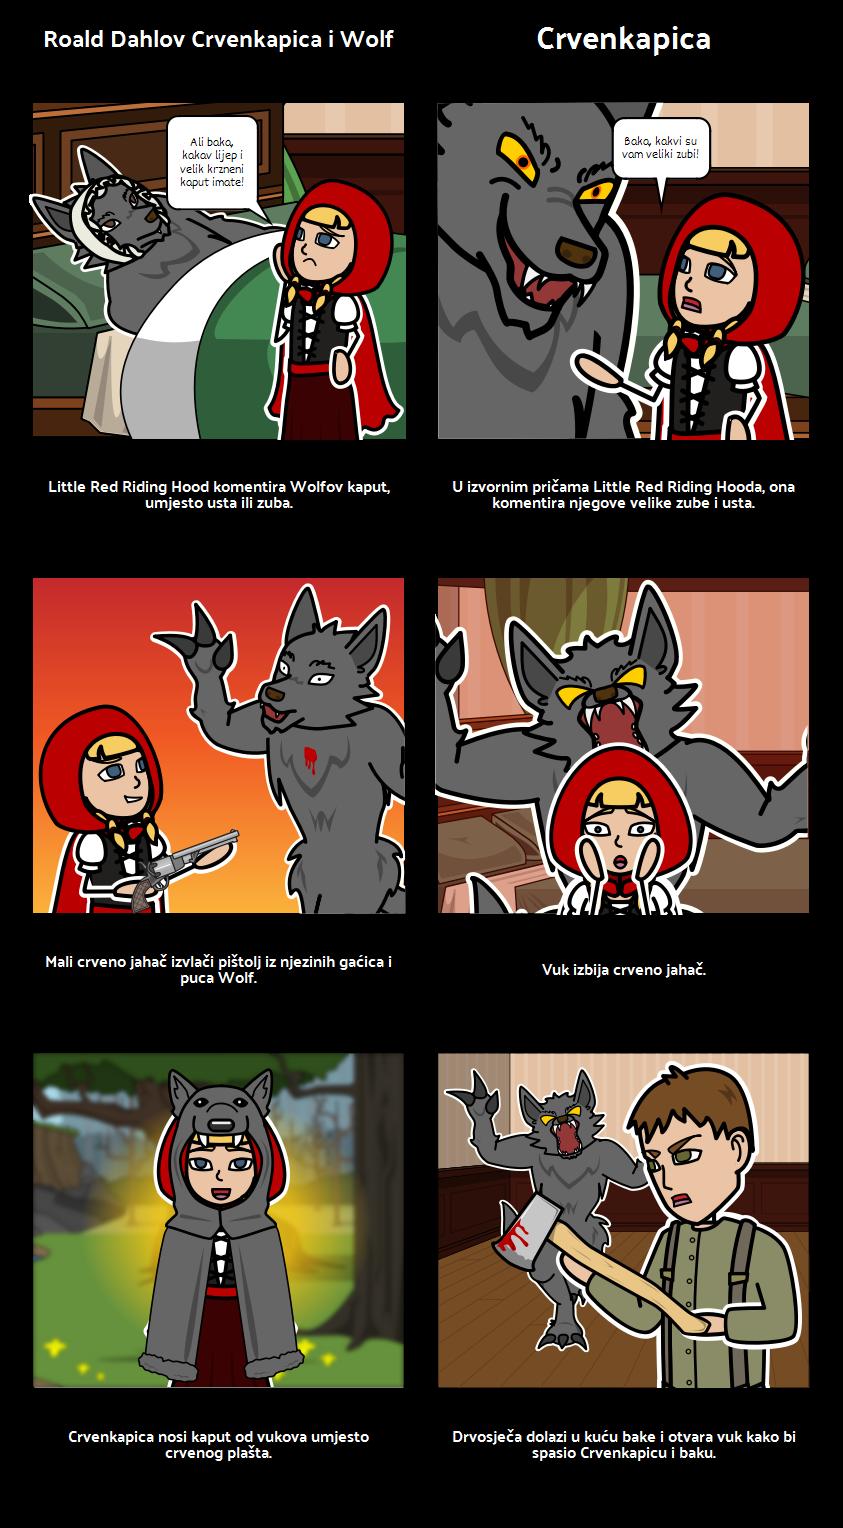 Crvenkapica i vuk - Usporedi / Kontrast